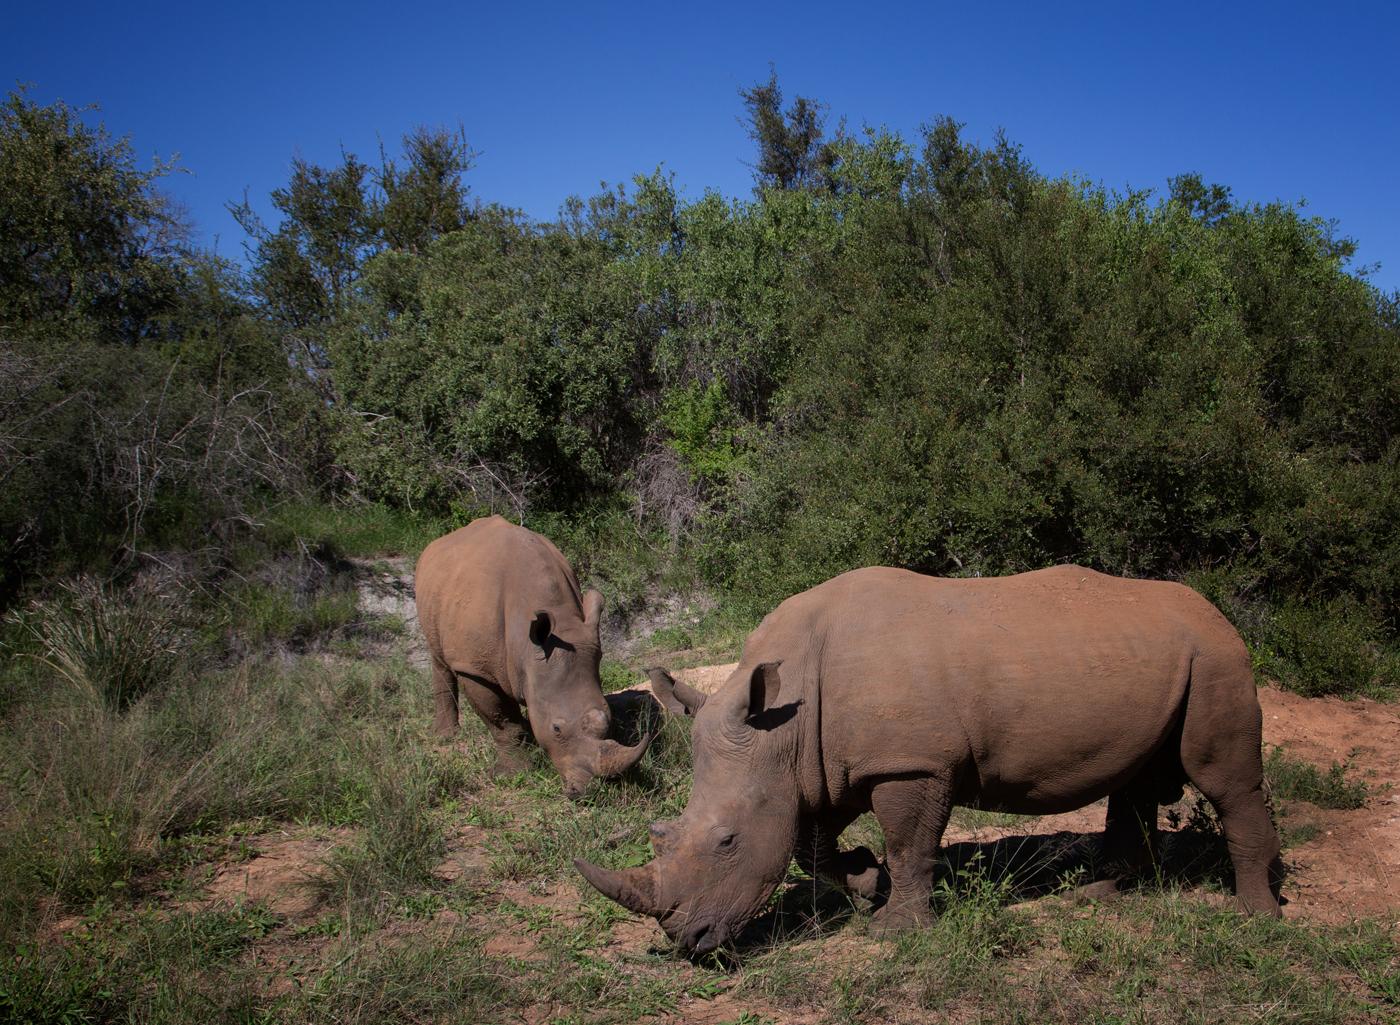 two rhinos copy 3.jpg